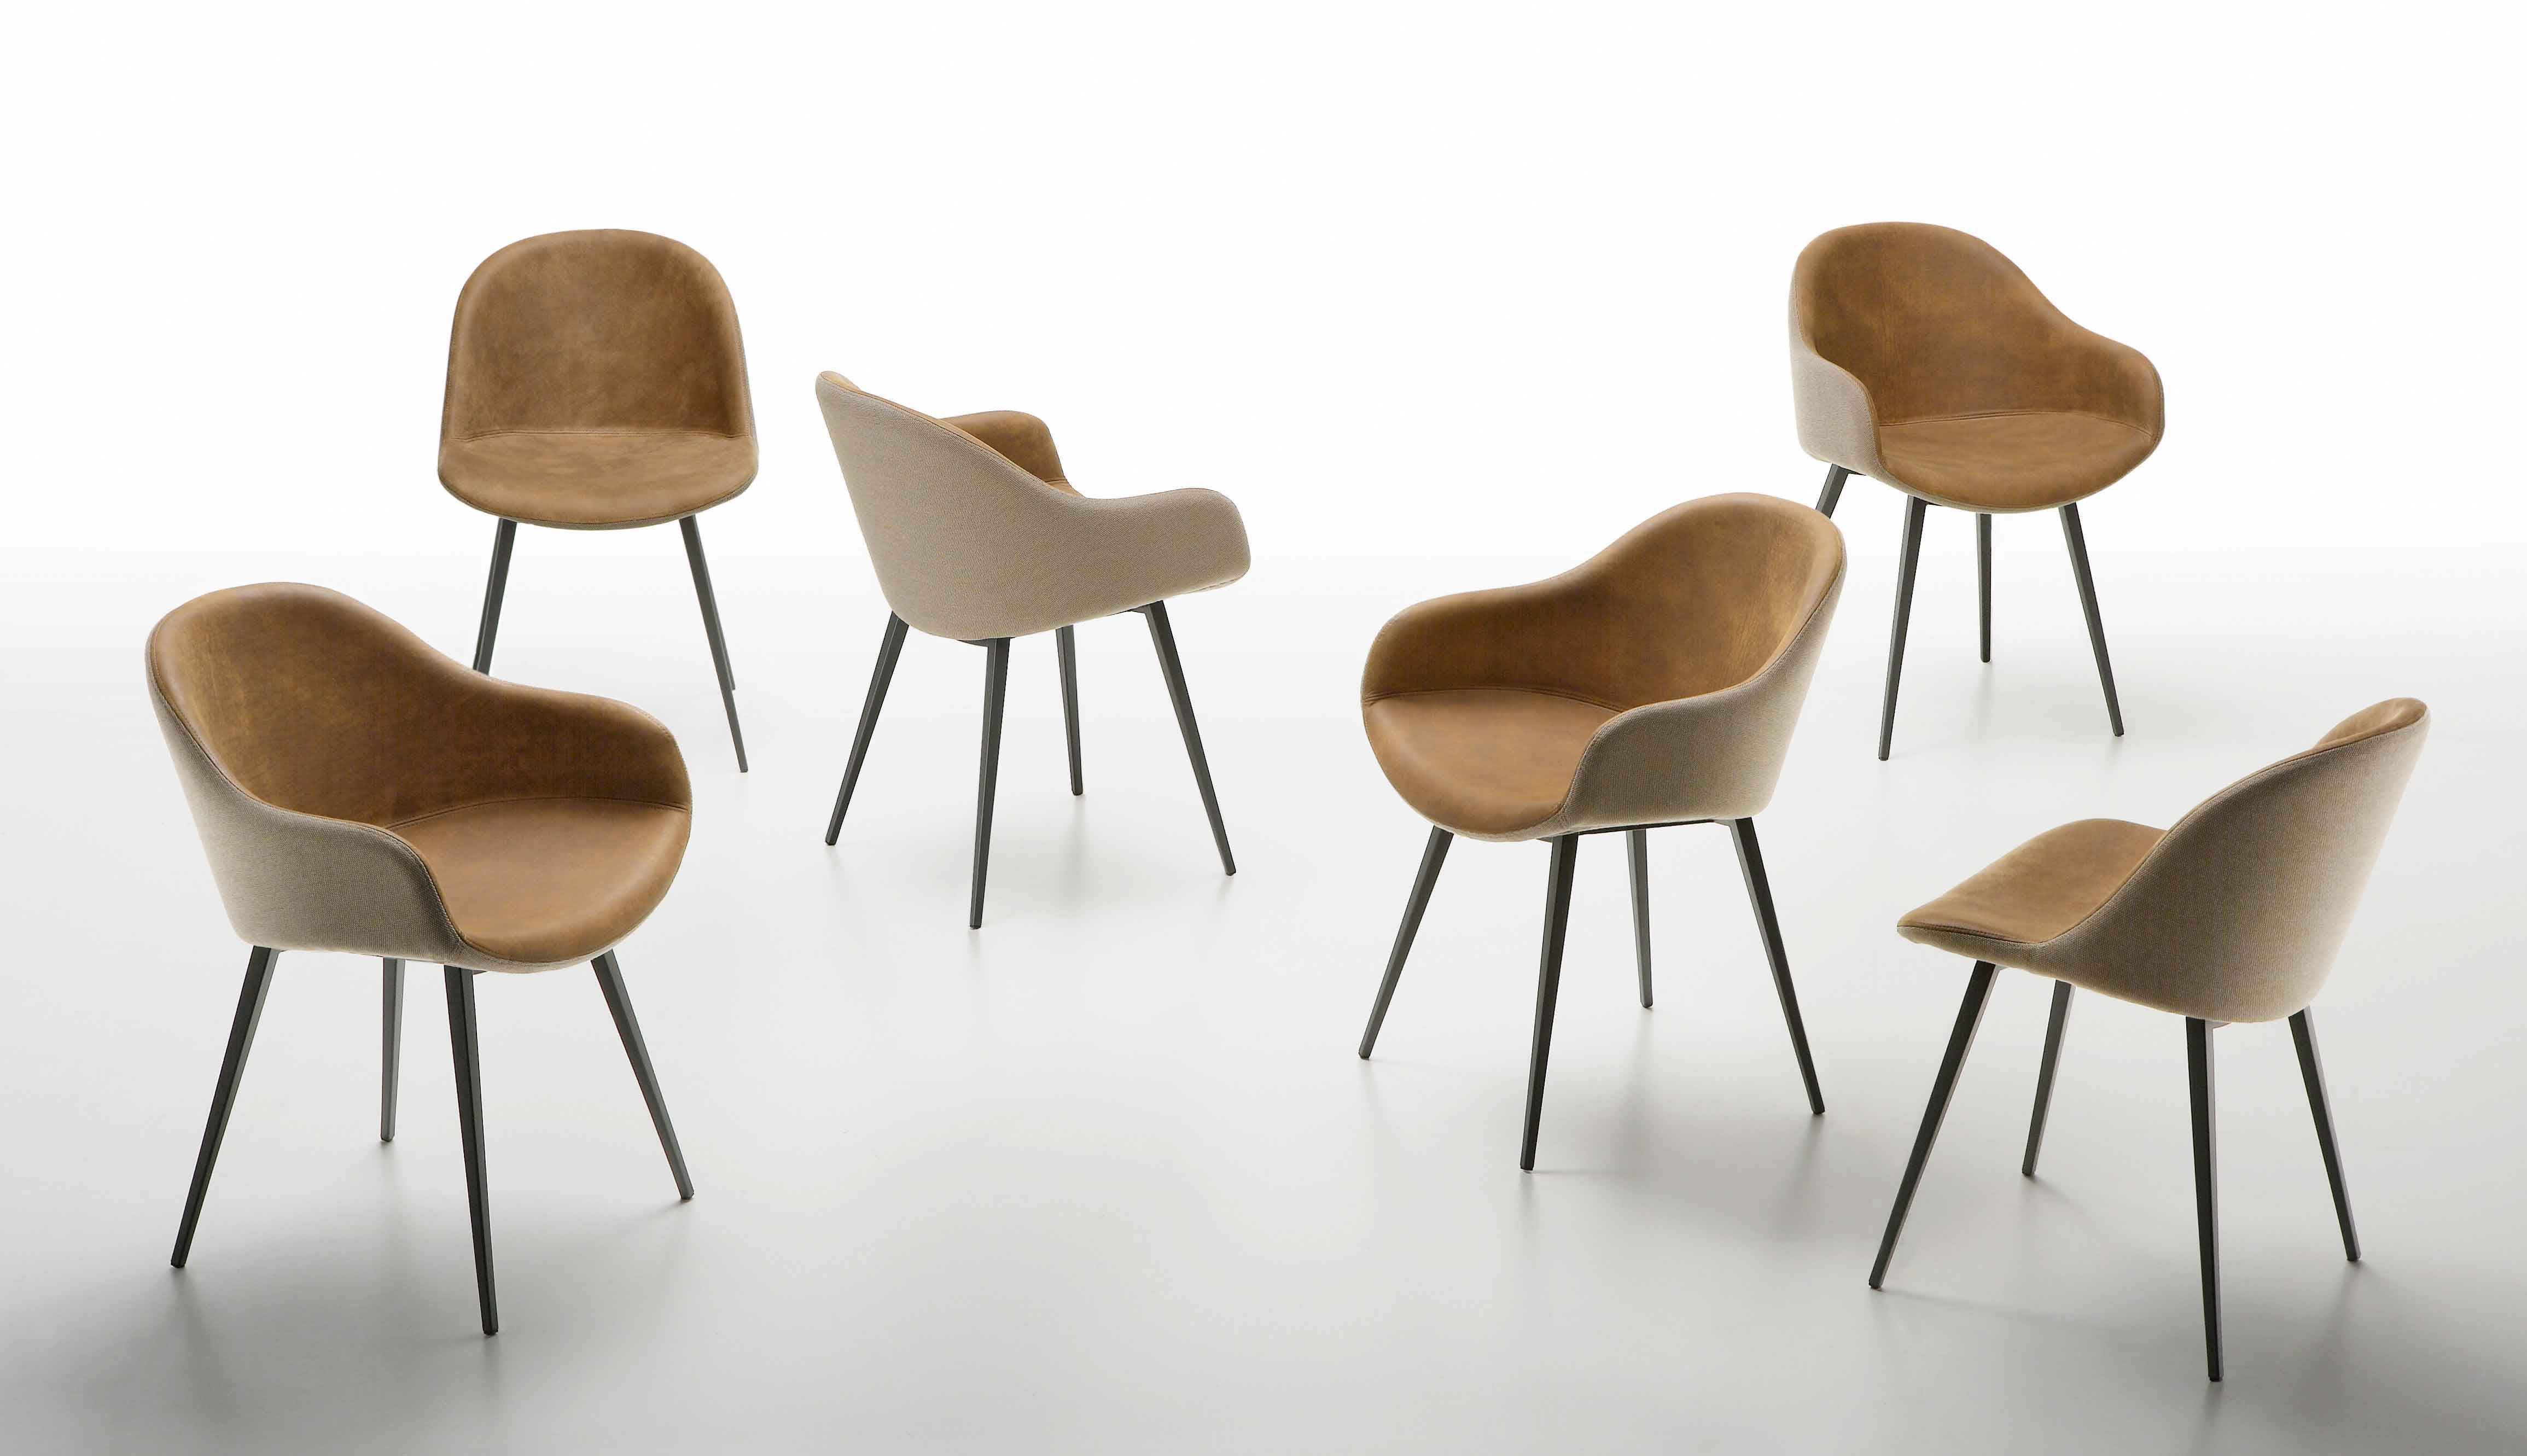 Cadeiras Modernas Modern Chairs Wwwintense Mobiliariocom Ynnos Pb Q